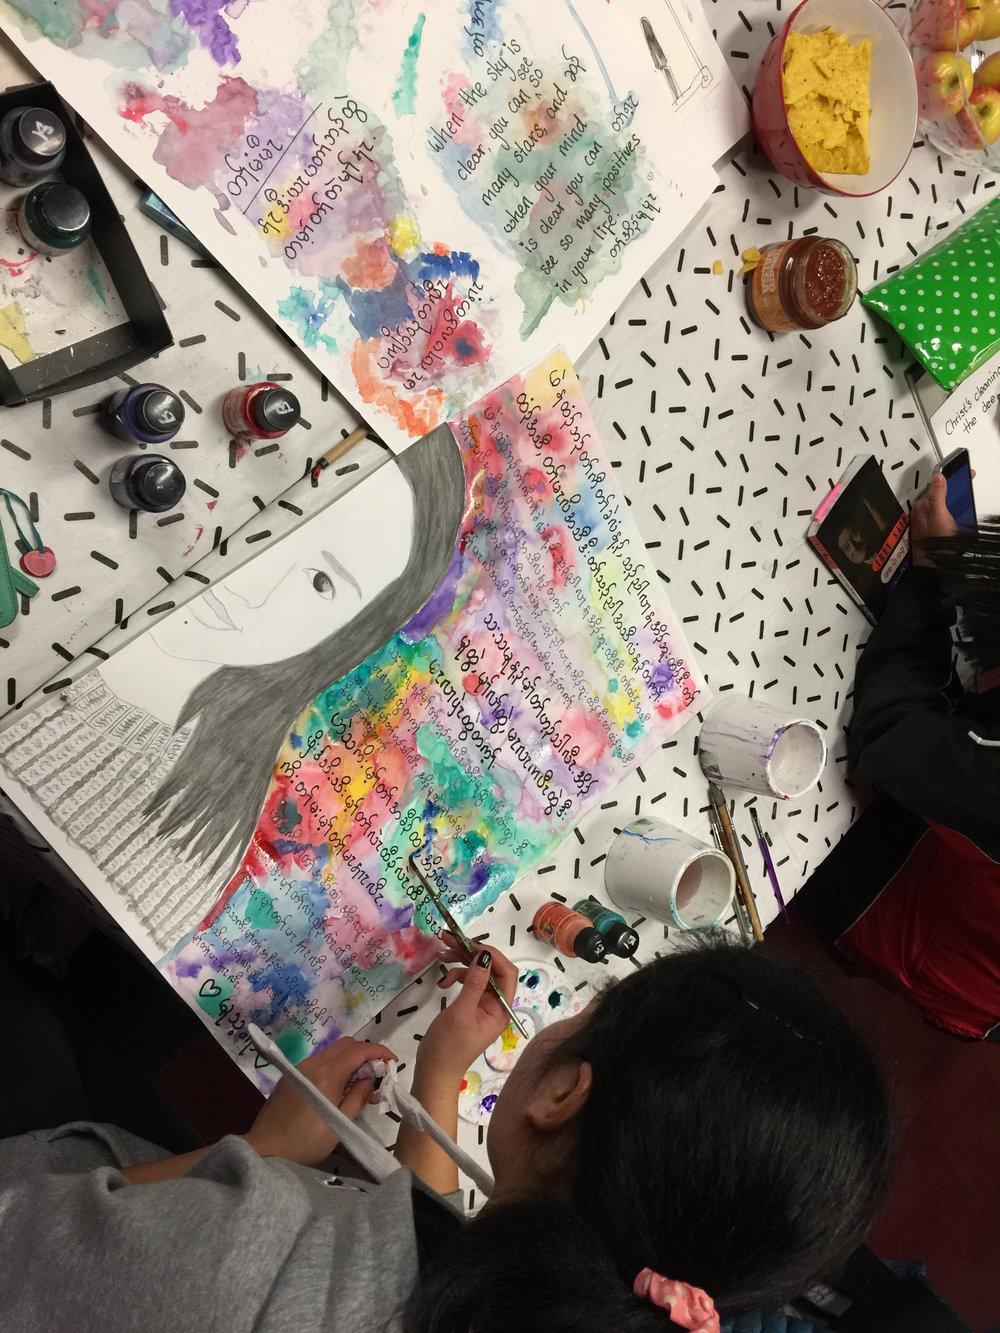 Sharing lives through art - Drawn Together | Geelong 2018